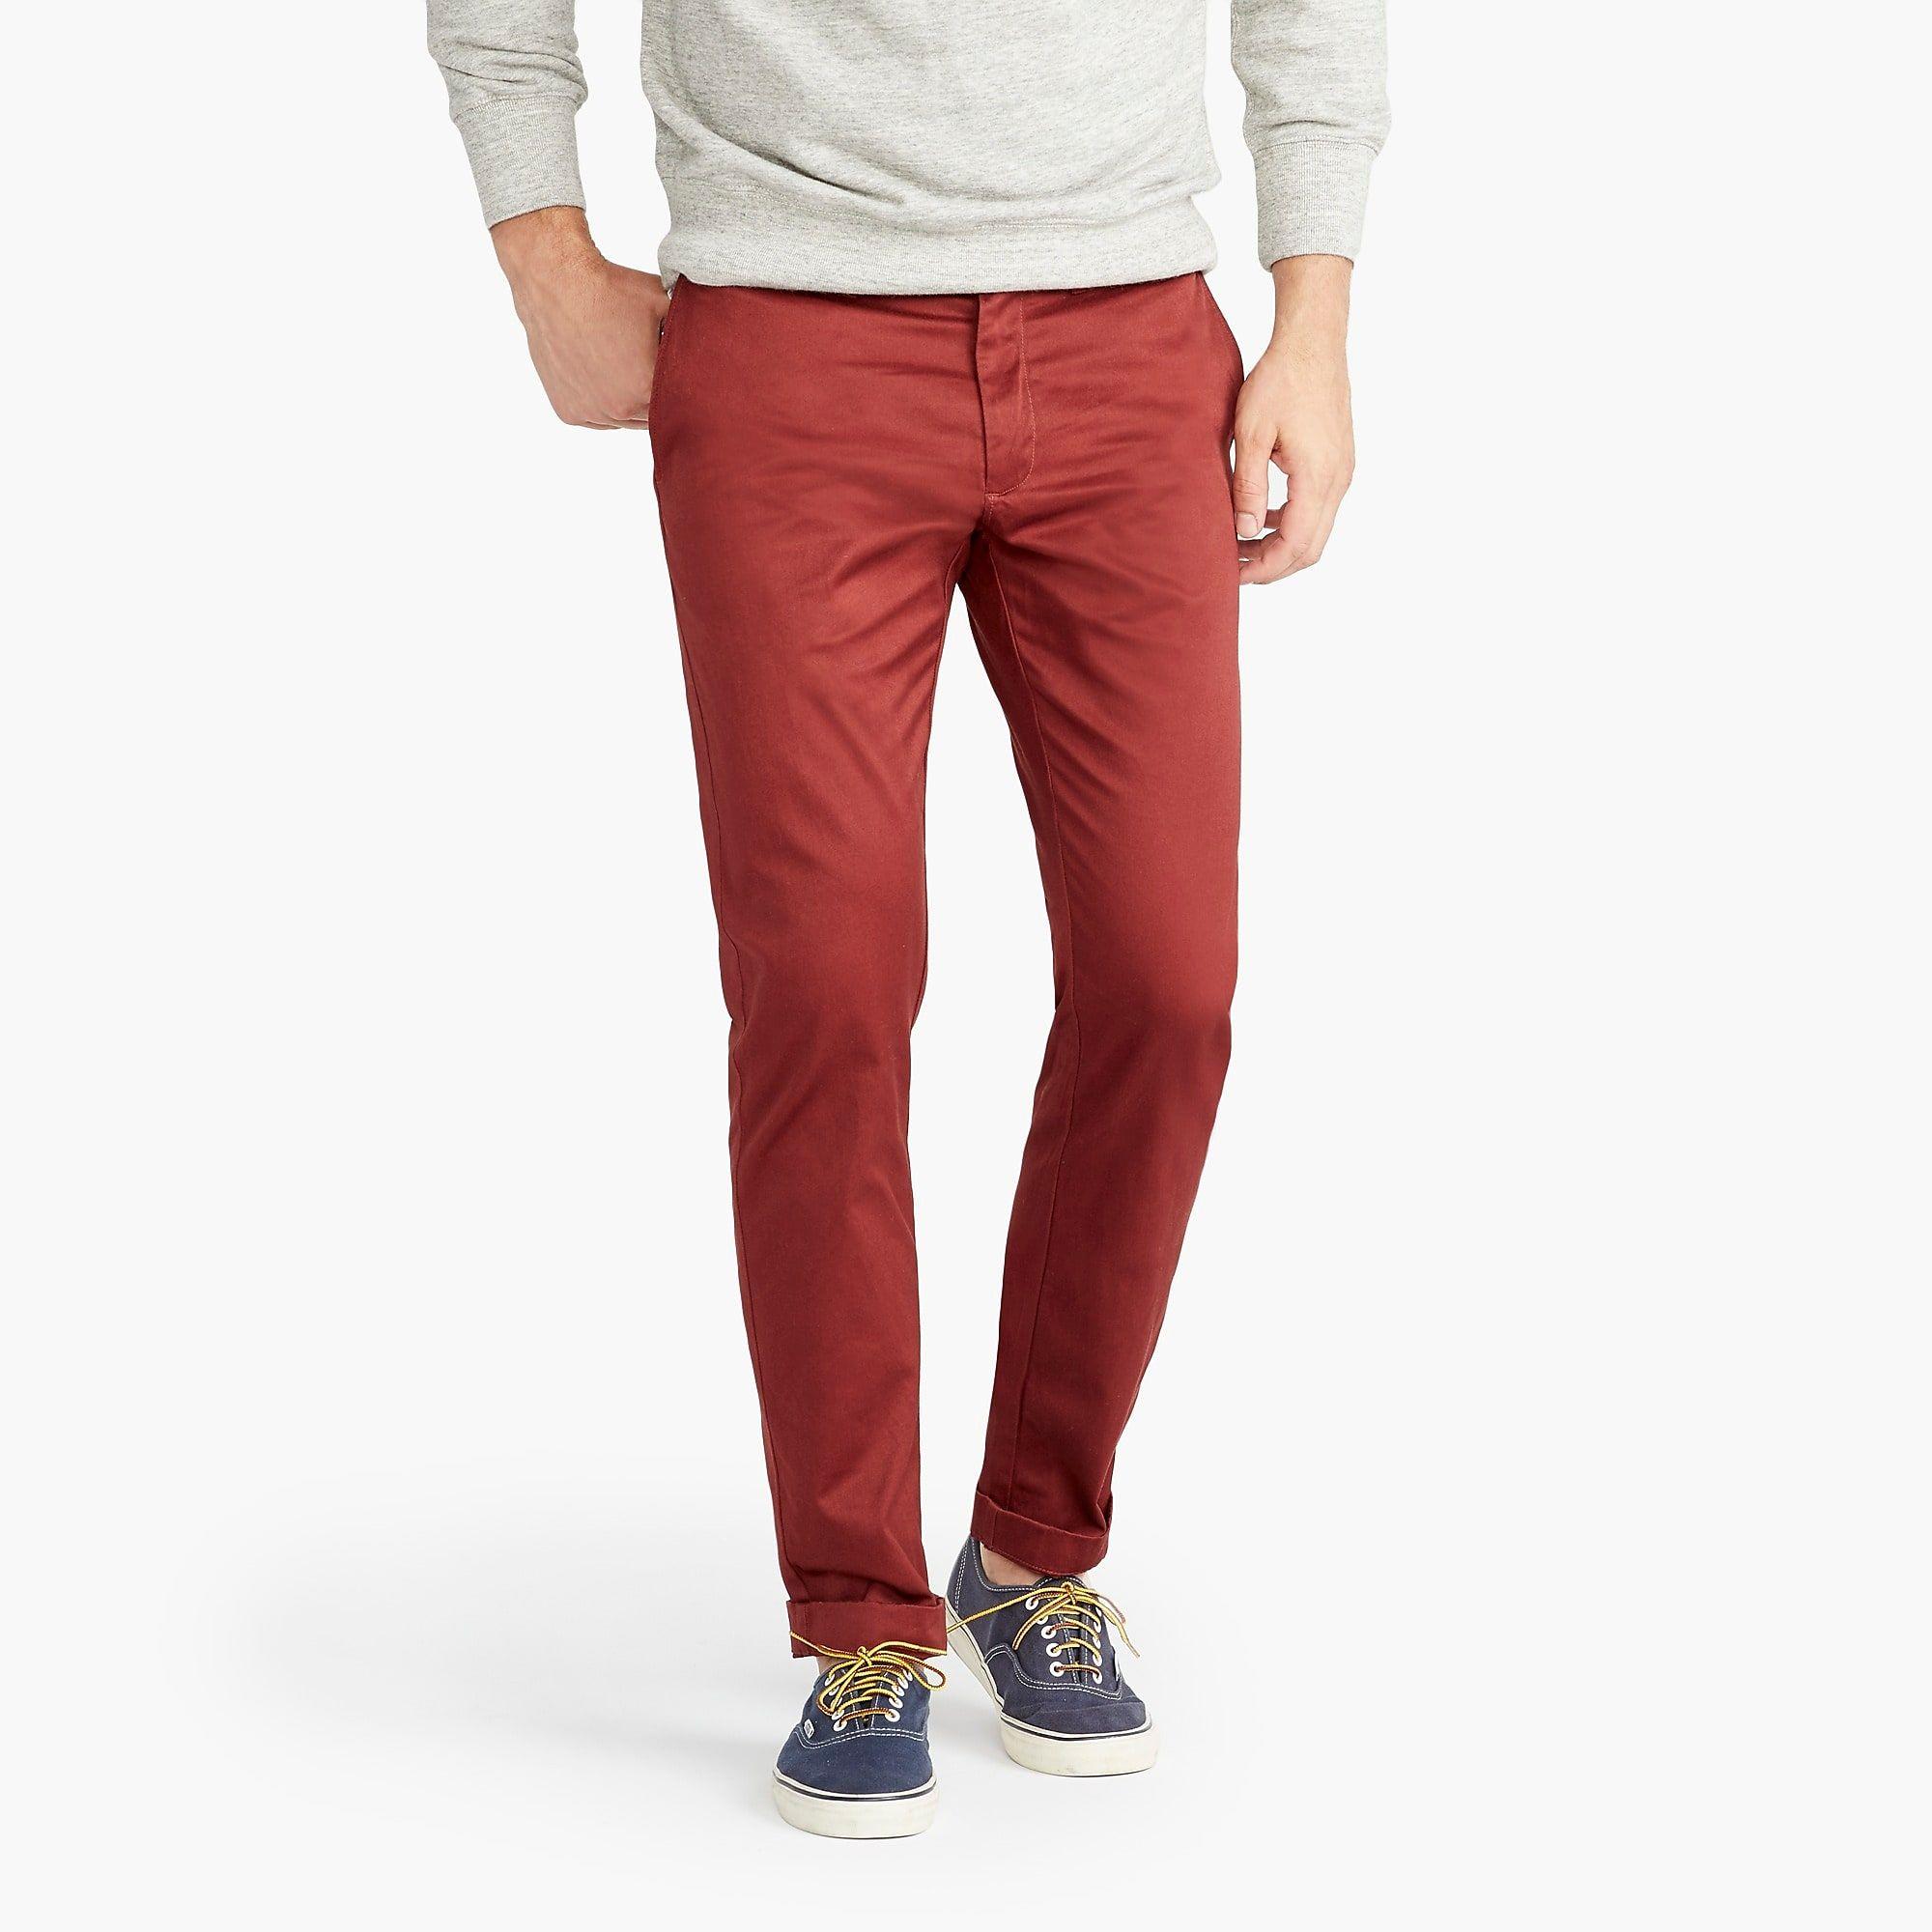 484 slimfit pant in stretch chino slim fit pants mens